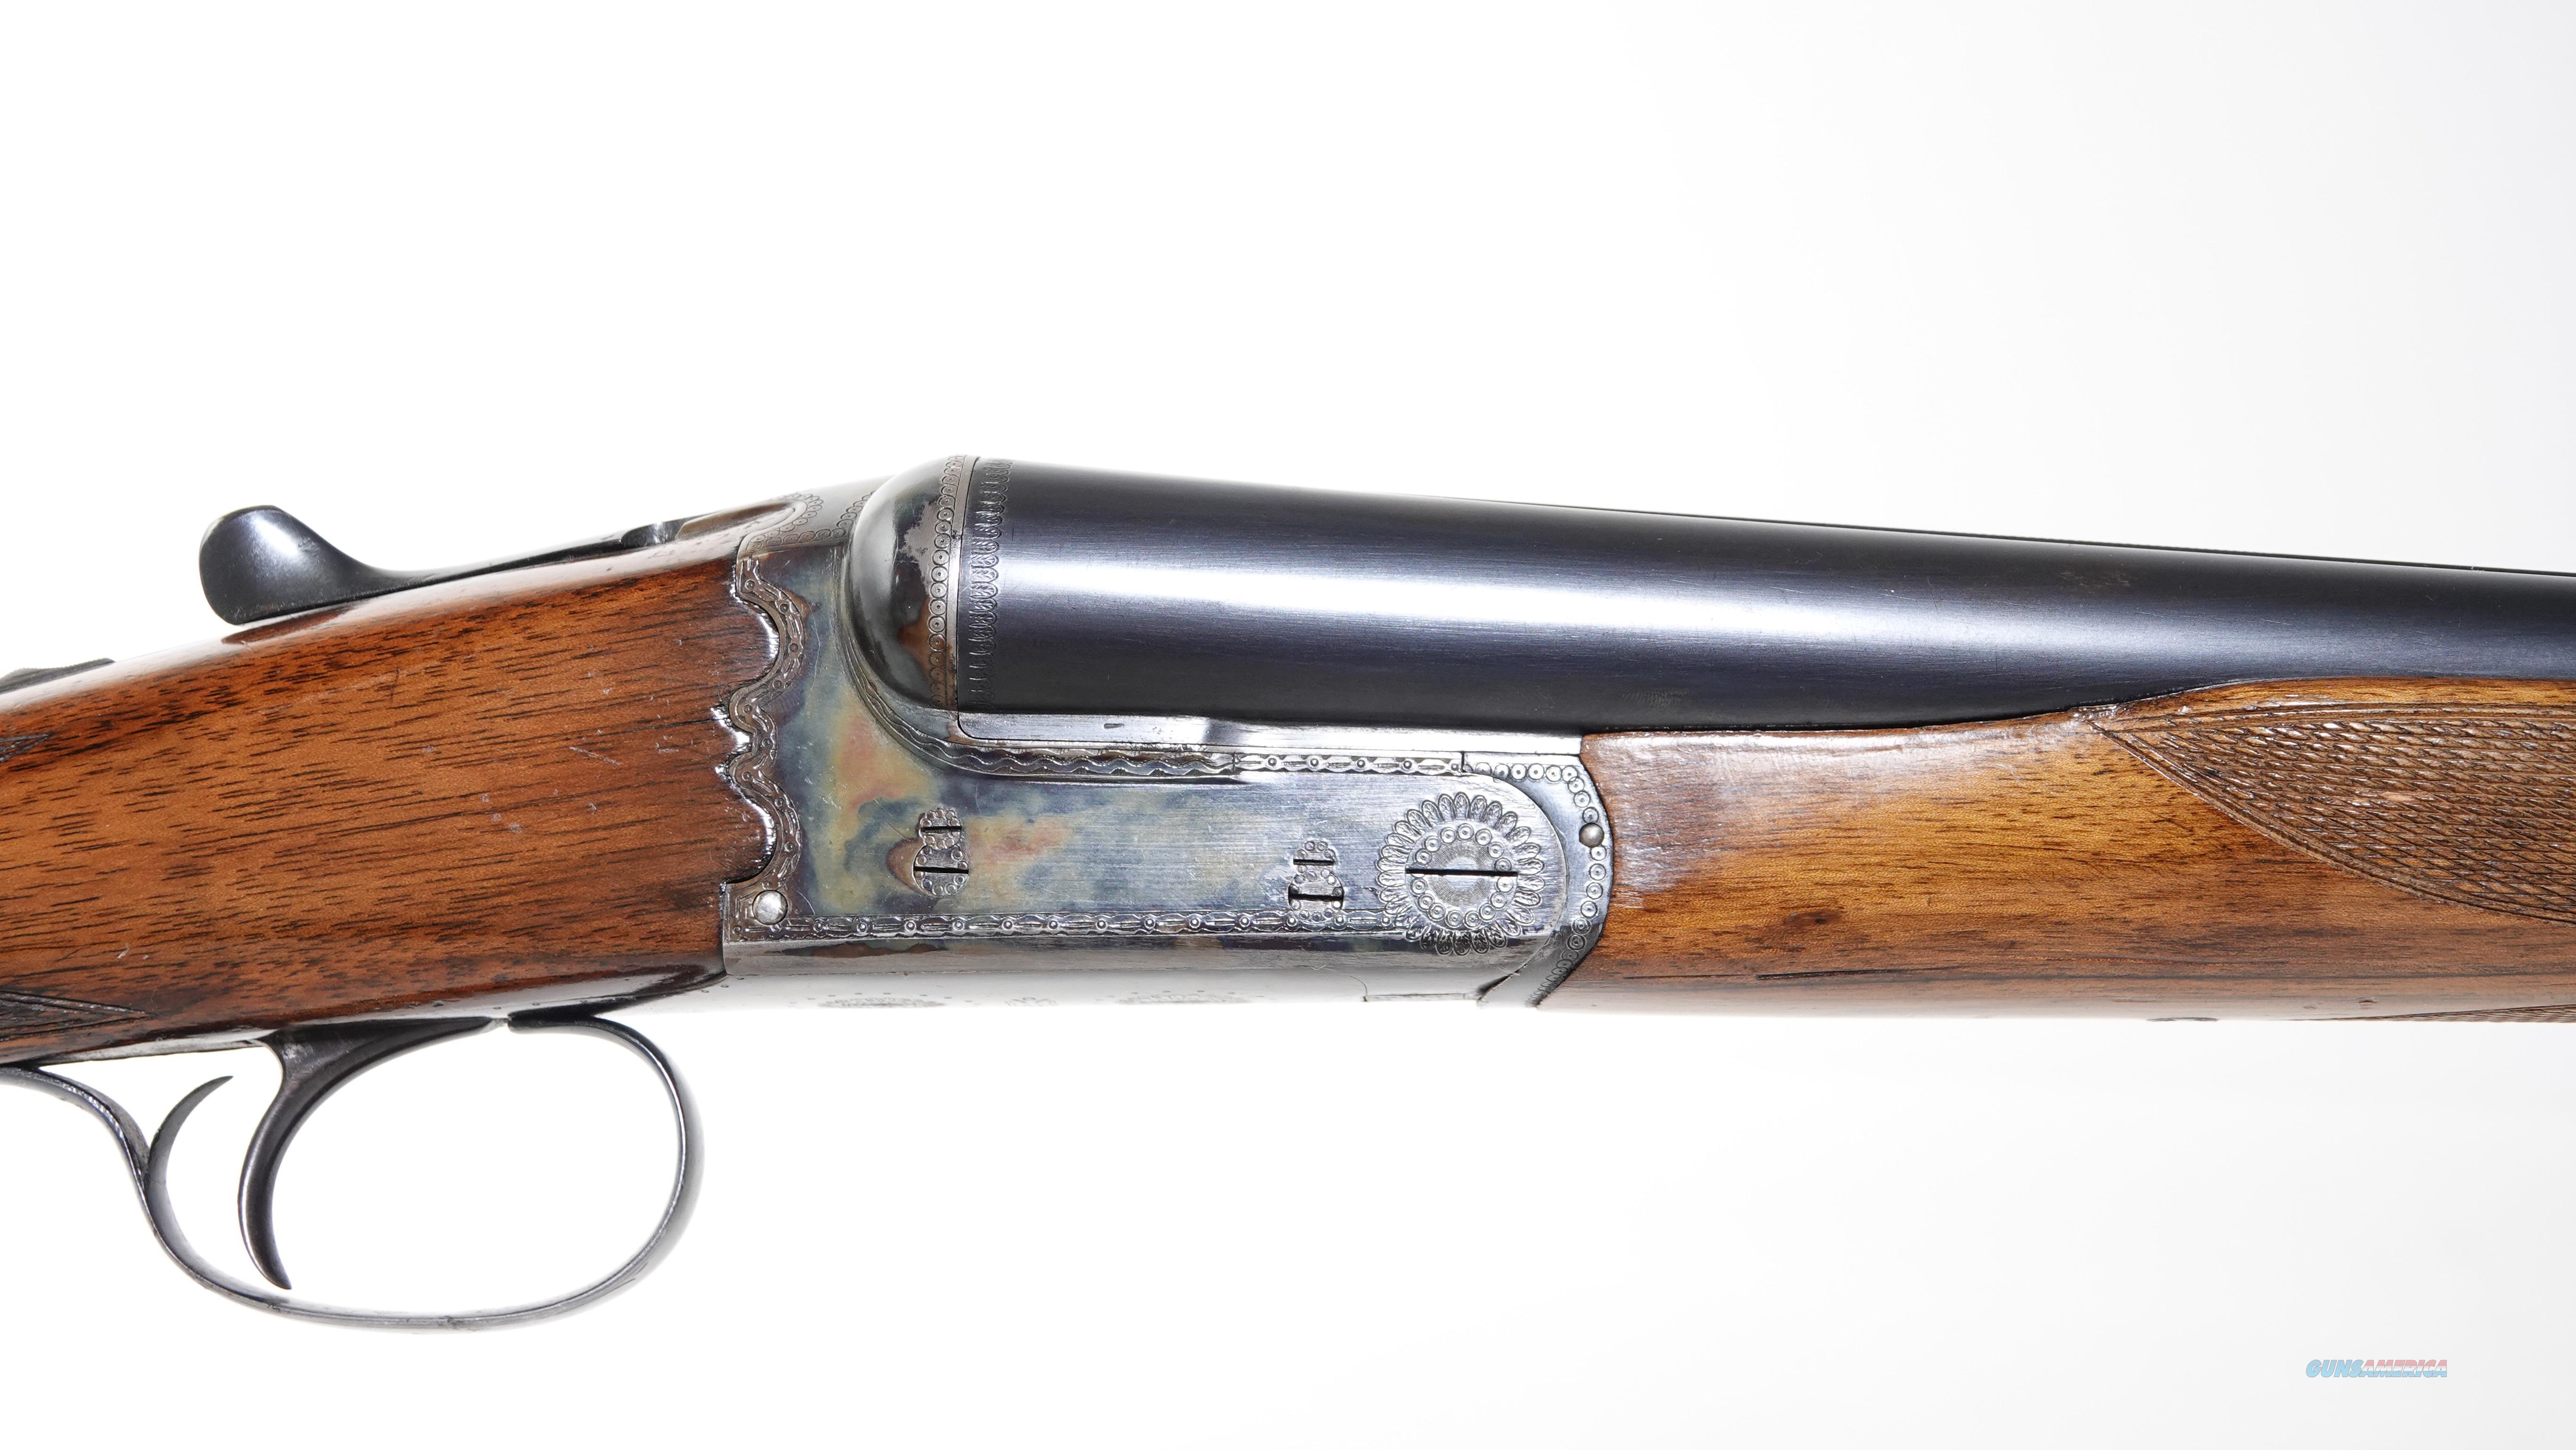 "F.lli Rizzini & Zoli - Abercrombie & Fitch, 12ga. 26"" barrels  Guns > Shotguns > Rizzini Shotguns"